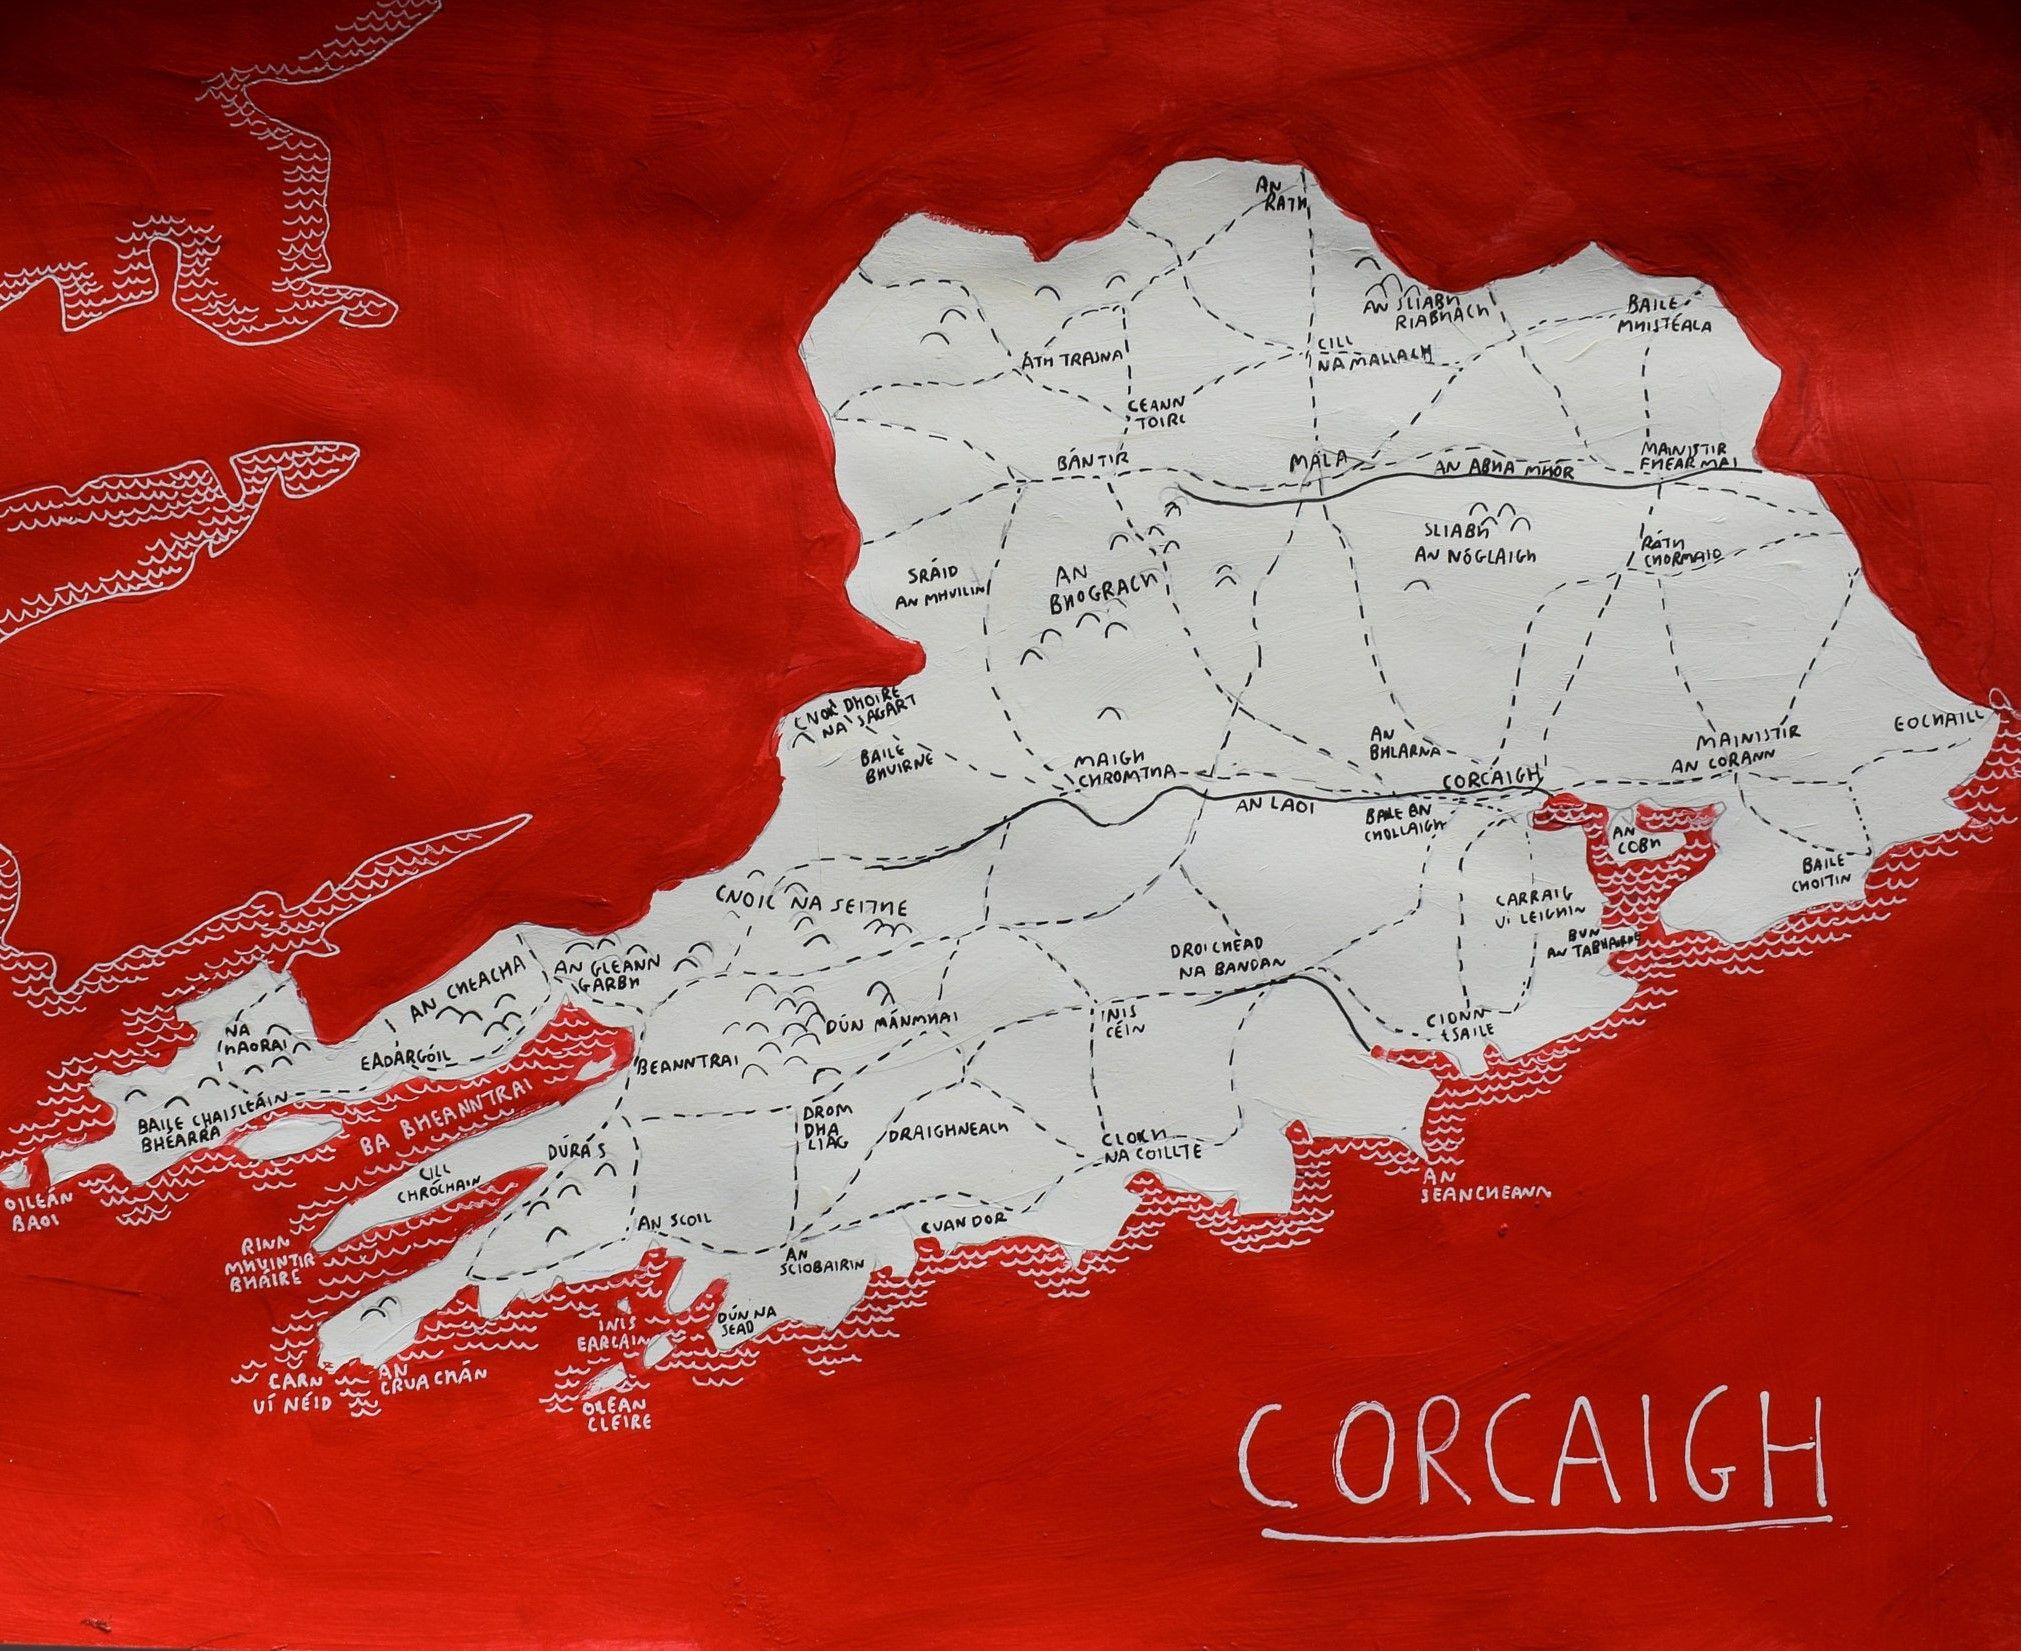 County Cork, Ireland map art | Irish County Maps | Map, County cork ...